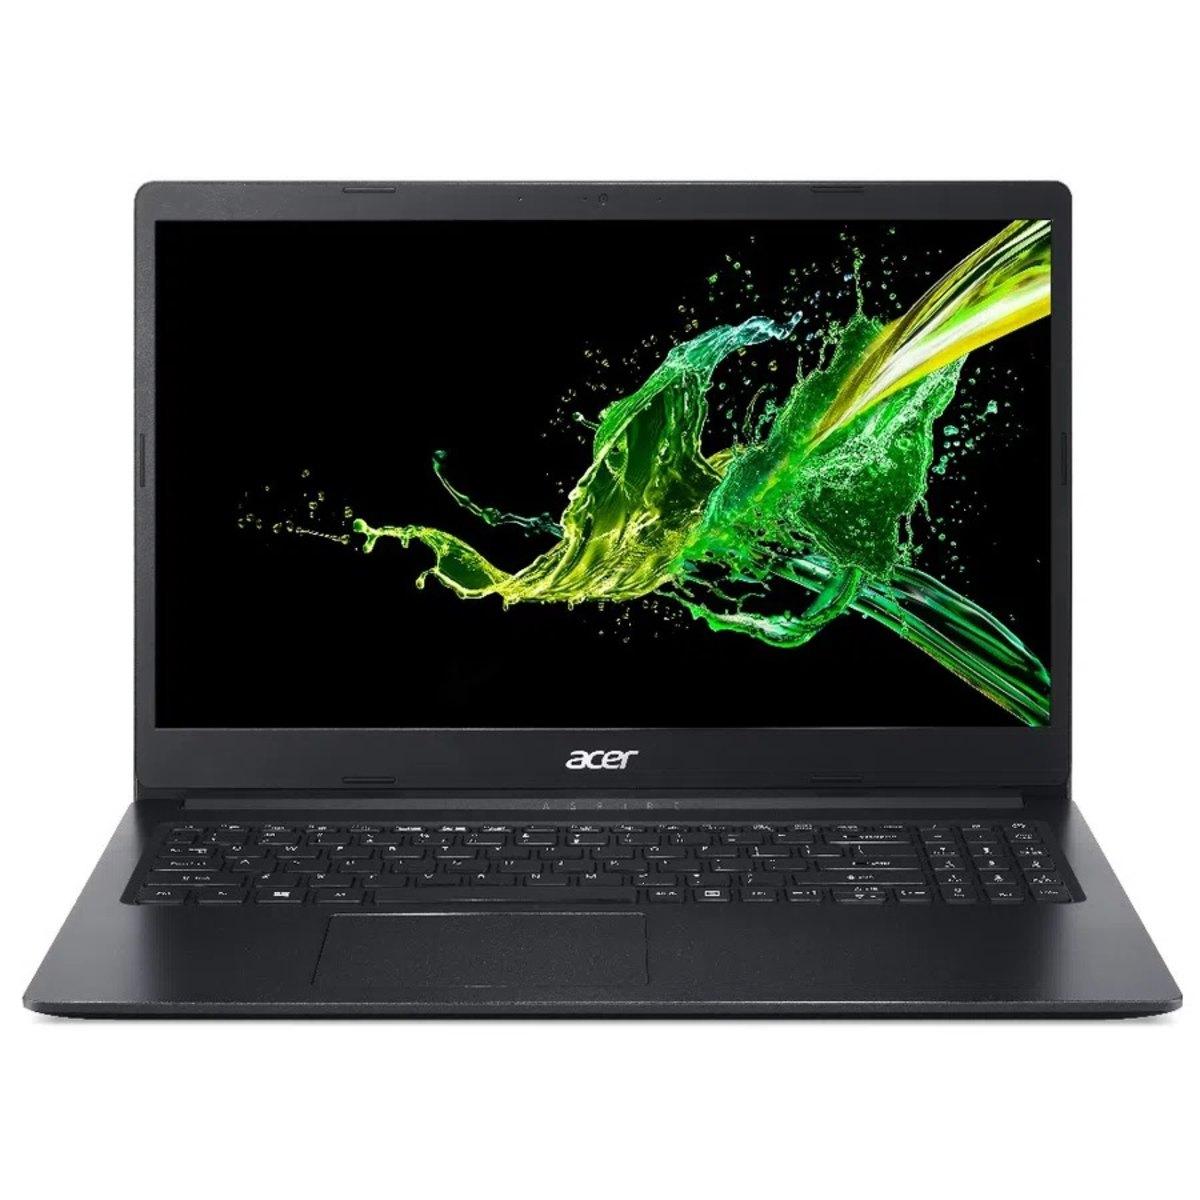 Notebook Acer A315 Intel Celeron N4000 Memoria 8gb Ssd 240gb Tela 15.6' Hd Endless Os